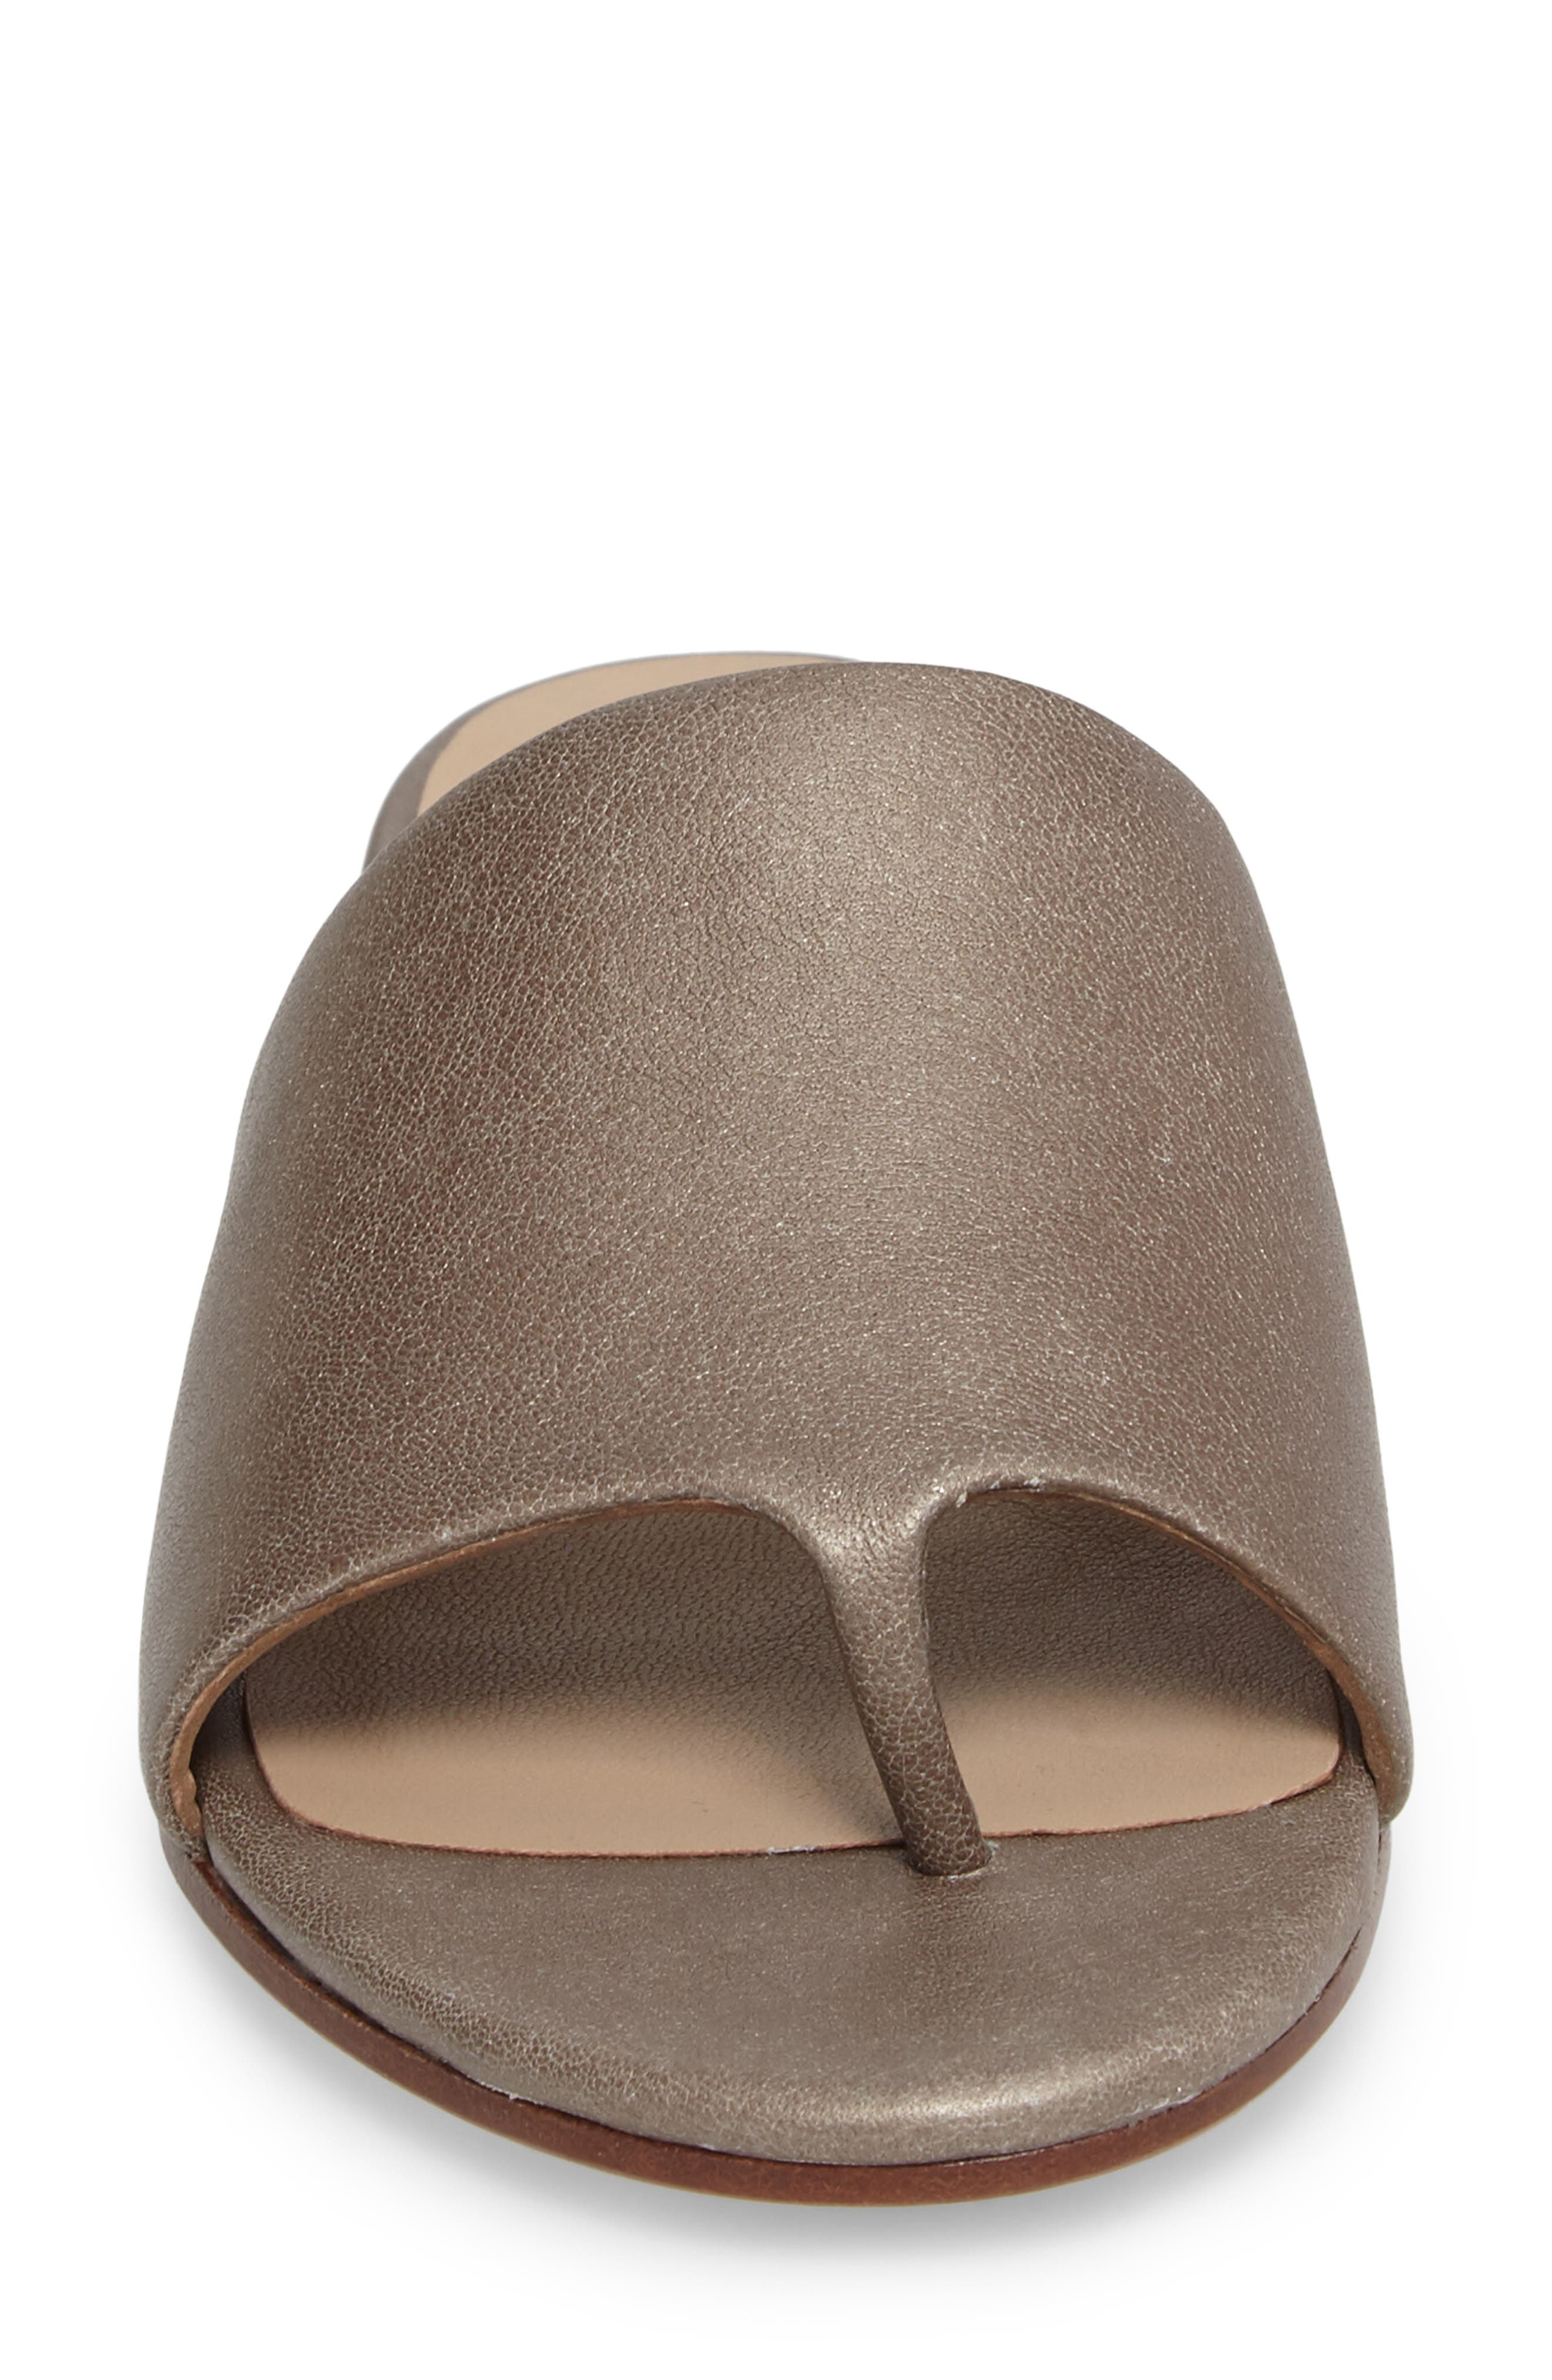 Beal Slide Sandal,                             Alternate thumbnail 4, color,                             Pyrite Leather